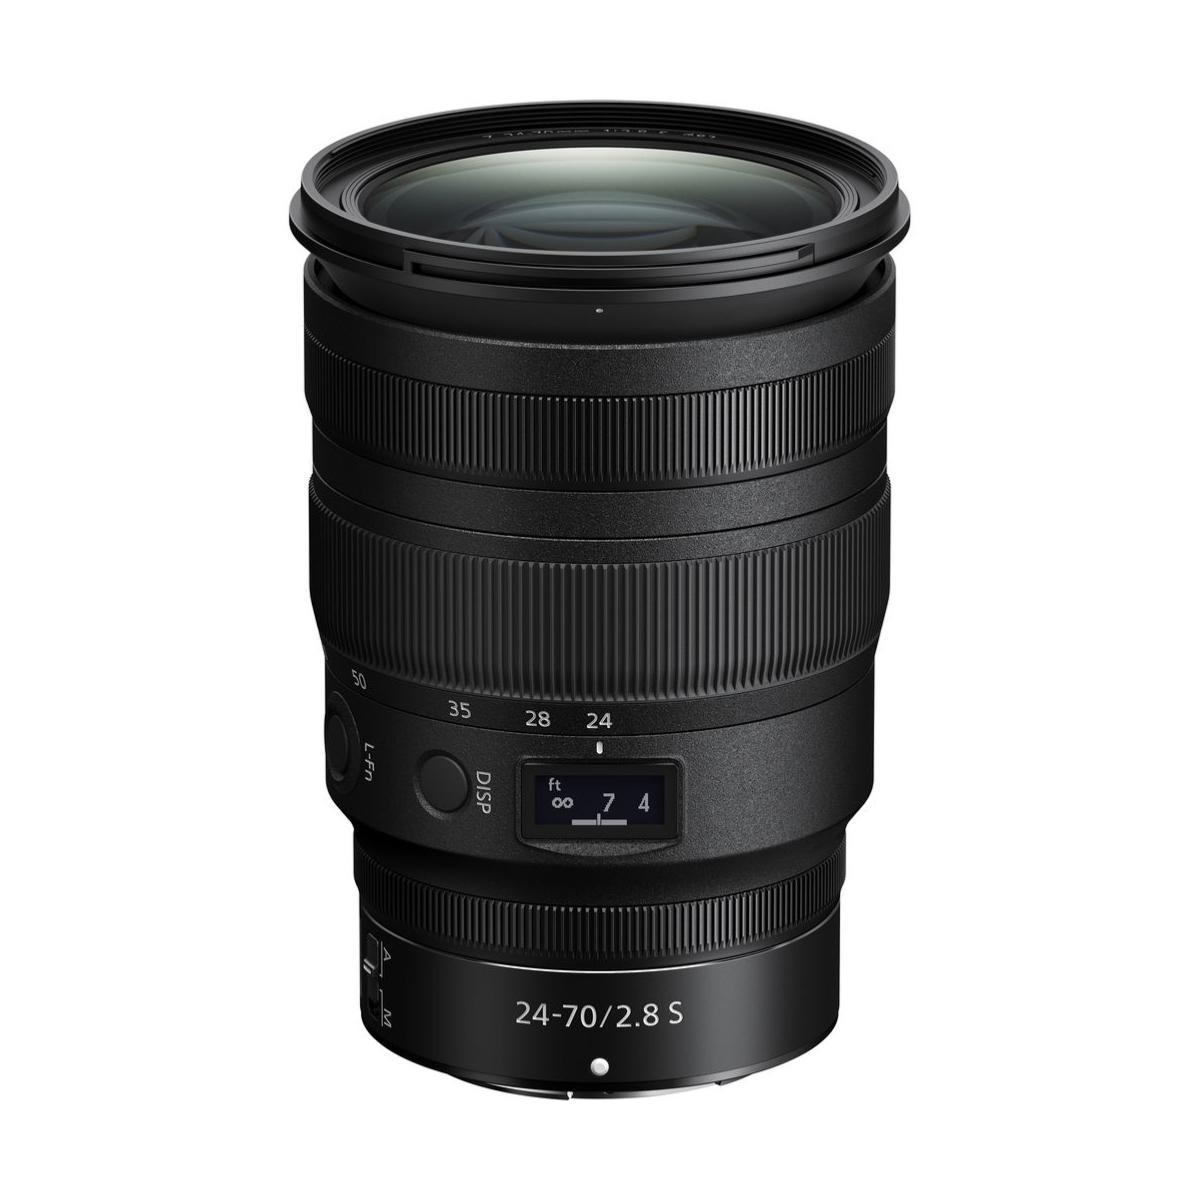 Nikon Objectif Nikkor Z 24-70mm f/2.8 S - Prophot